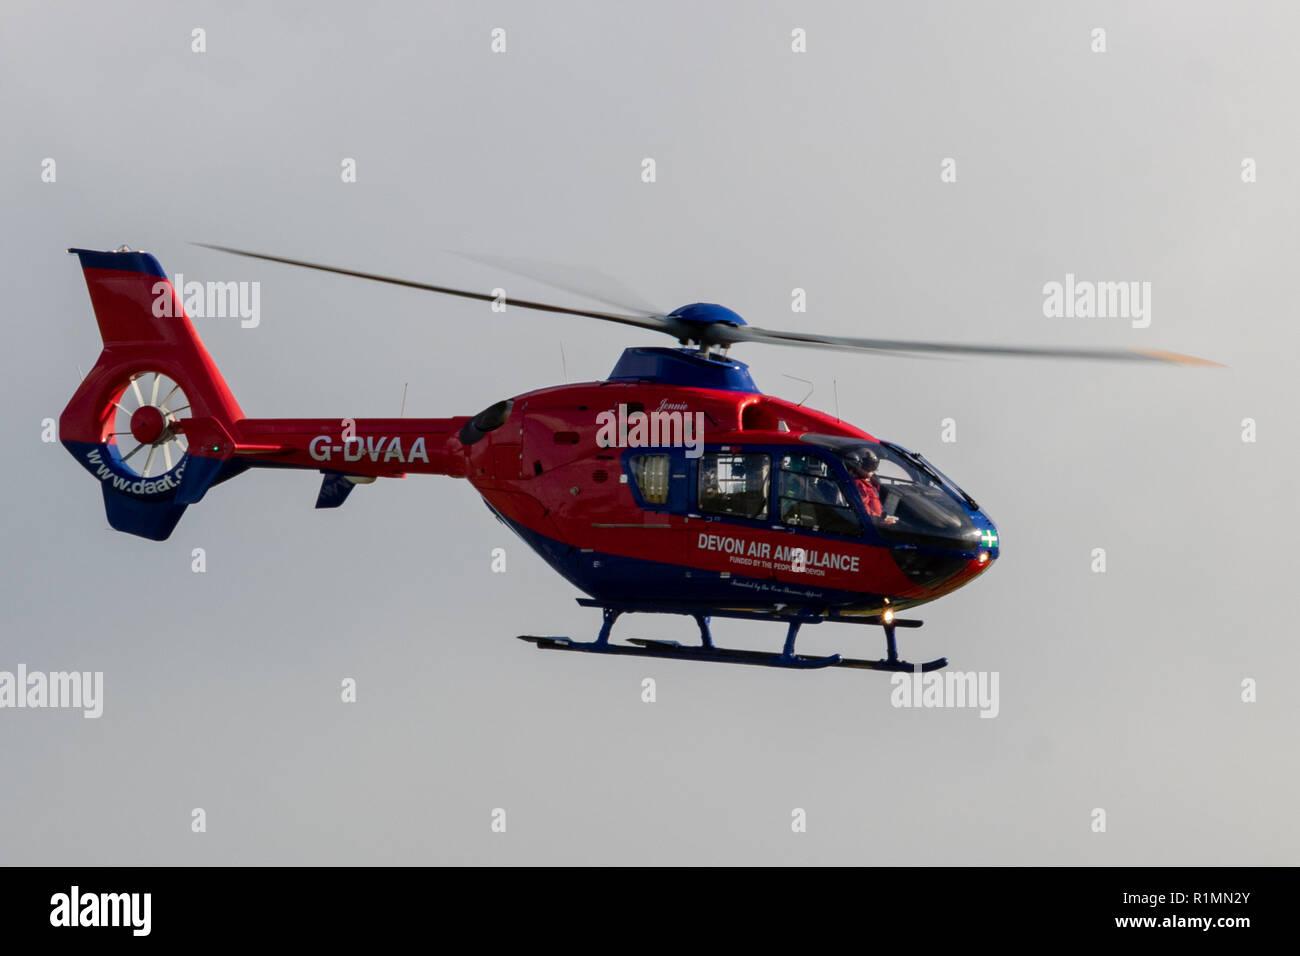 Devon Air Ambulance taking off from a farm near Barnstaple, North Devon 11th Nov 2018. - Stock Image